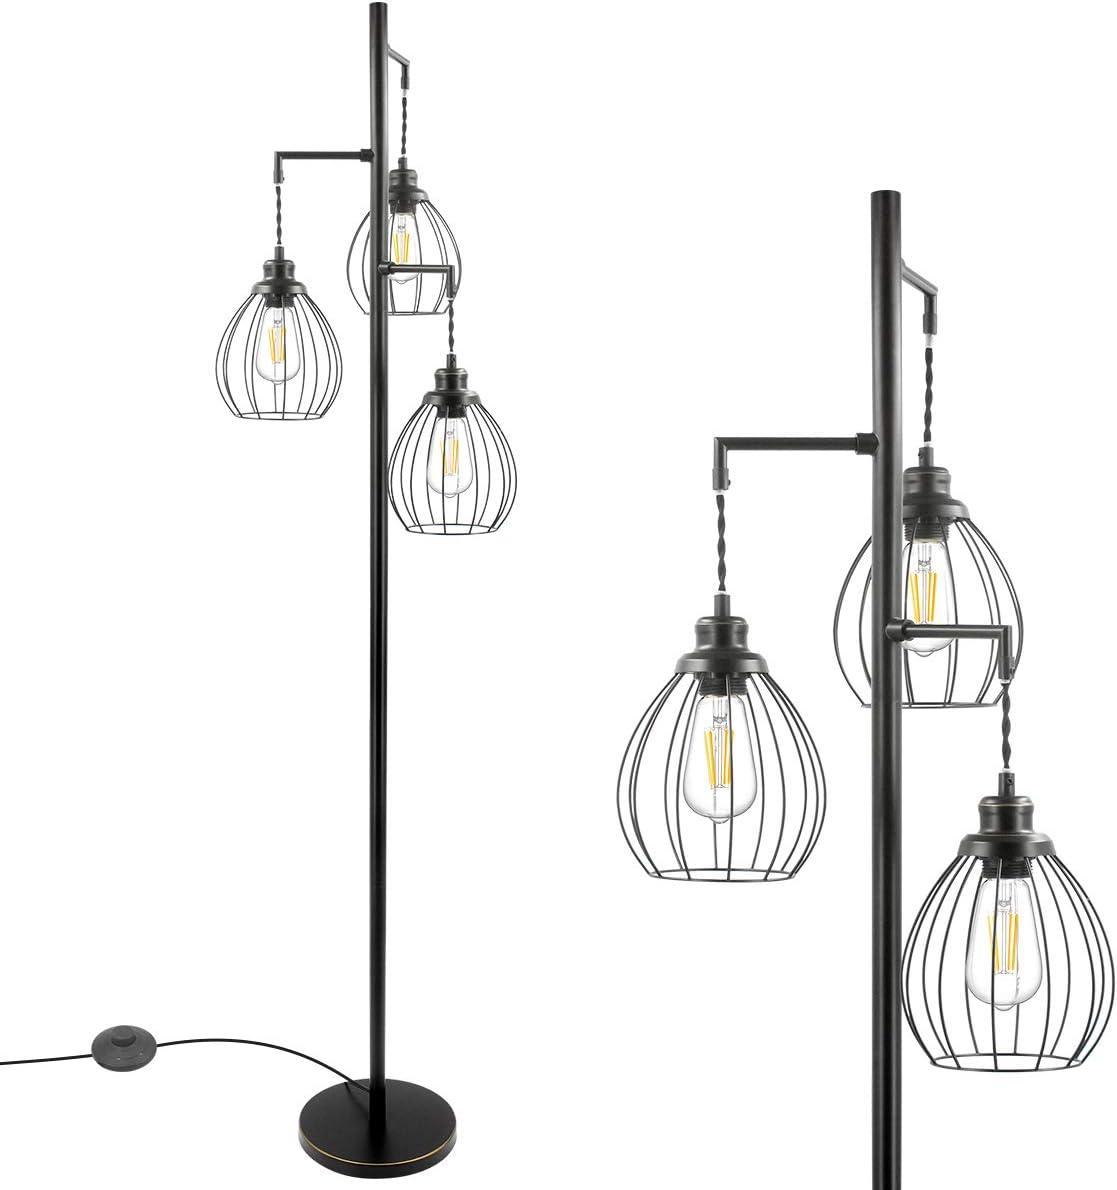 Industrial Floor Lamp Standing Tree He Cage 3 Elegant Sale SALE% OFF Ranking TOP4 with